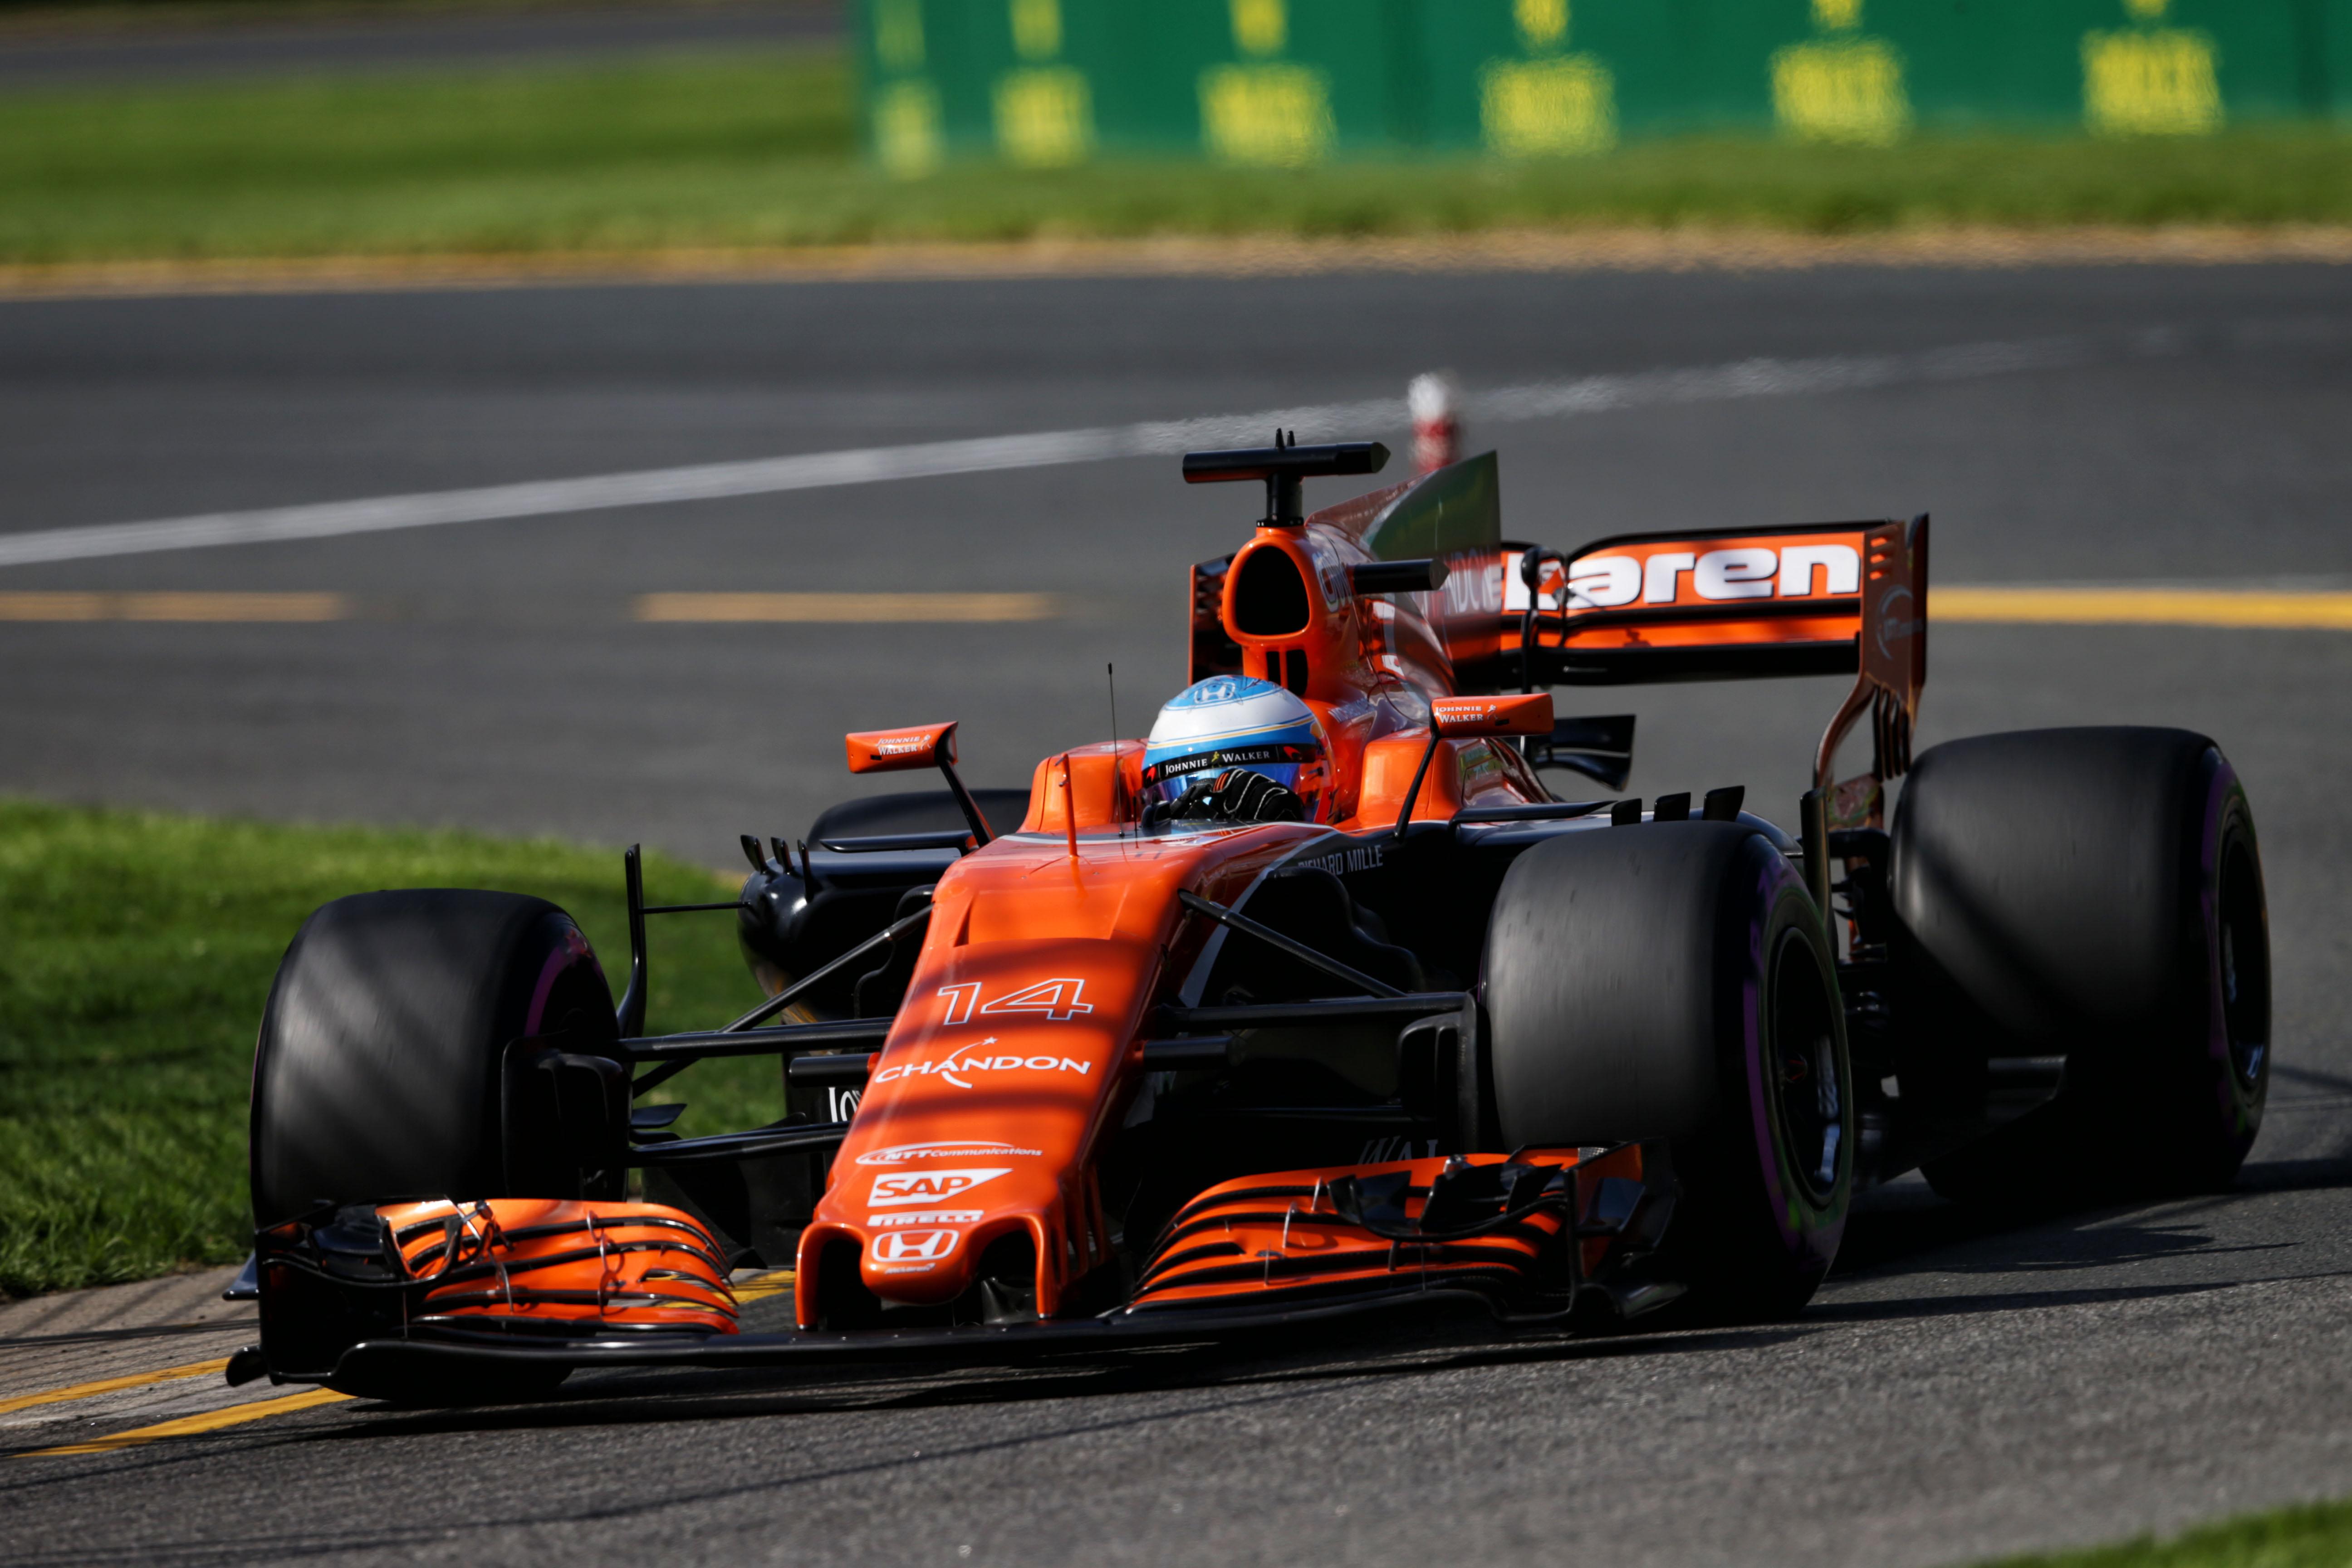 Wallpapers Australian Grand Prix of 2017 | Marco's Formula ...